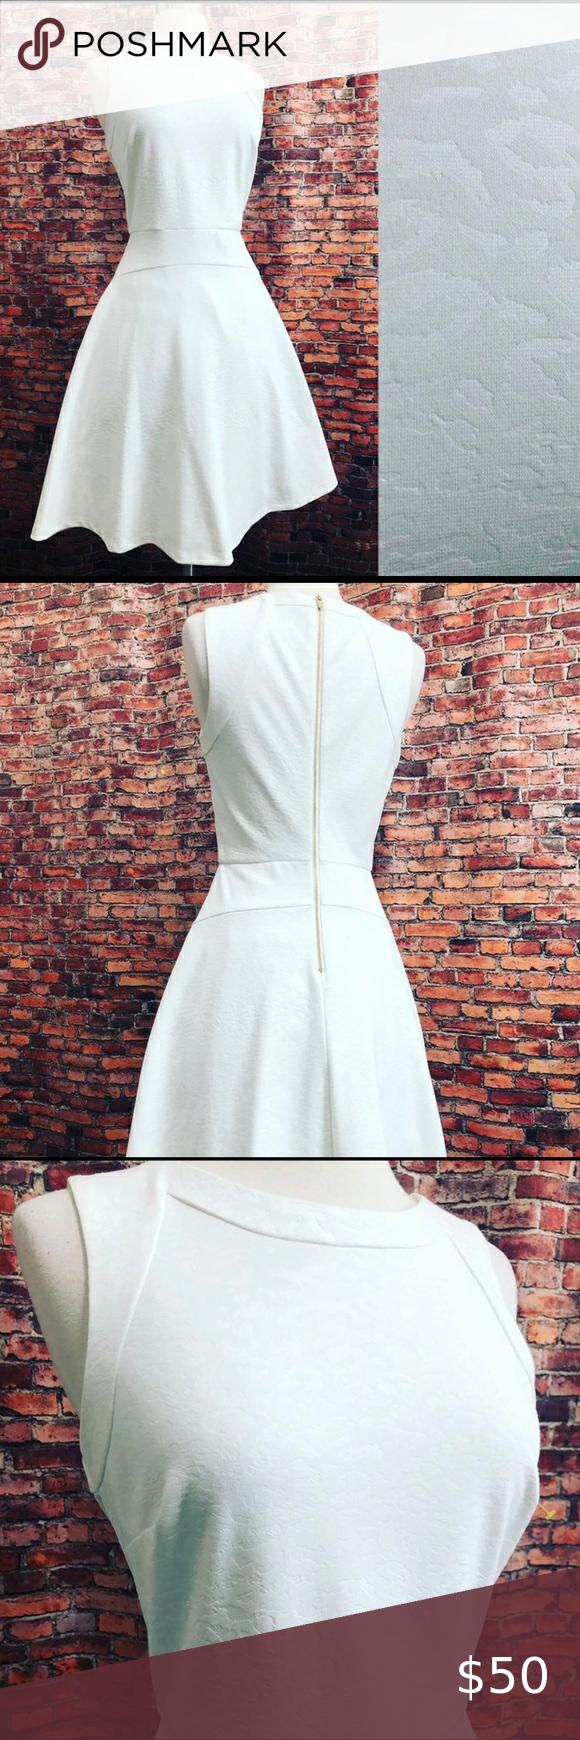 Calvin Klein White Fit Flare Dress W Stretch Dresses Fit Flare Fit Flare Dress [ 1740 x 580 Pixel ]